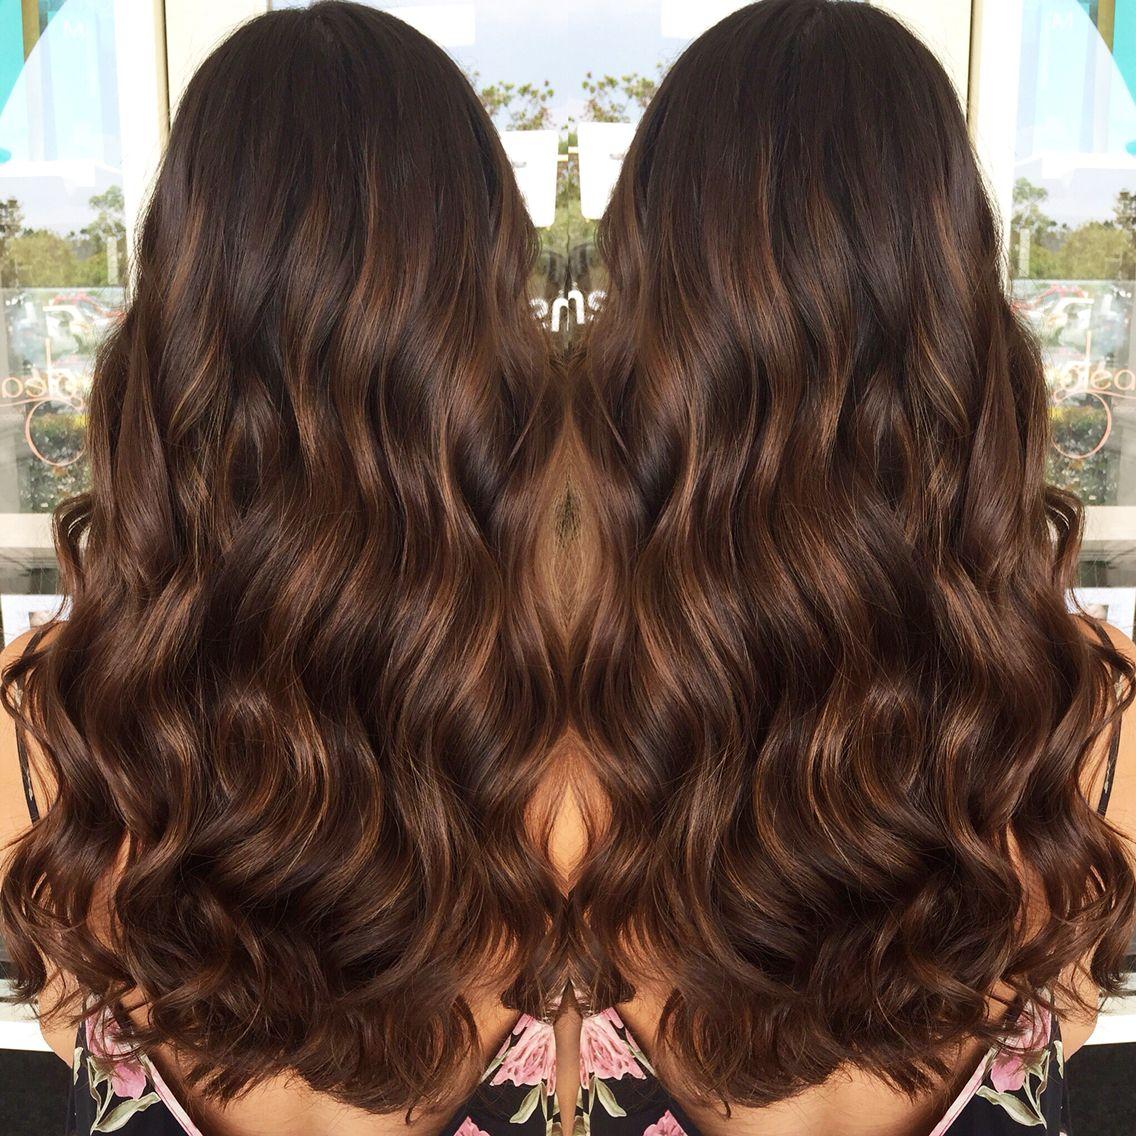 Carmel Balayage In 2019 Brown Hair Colors Balayage Hair